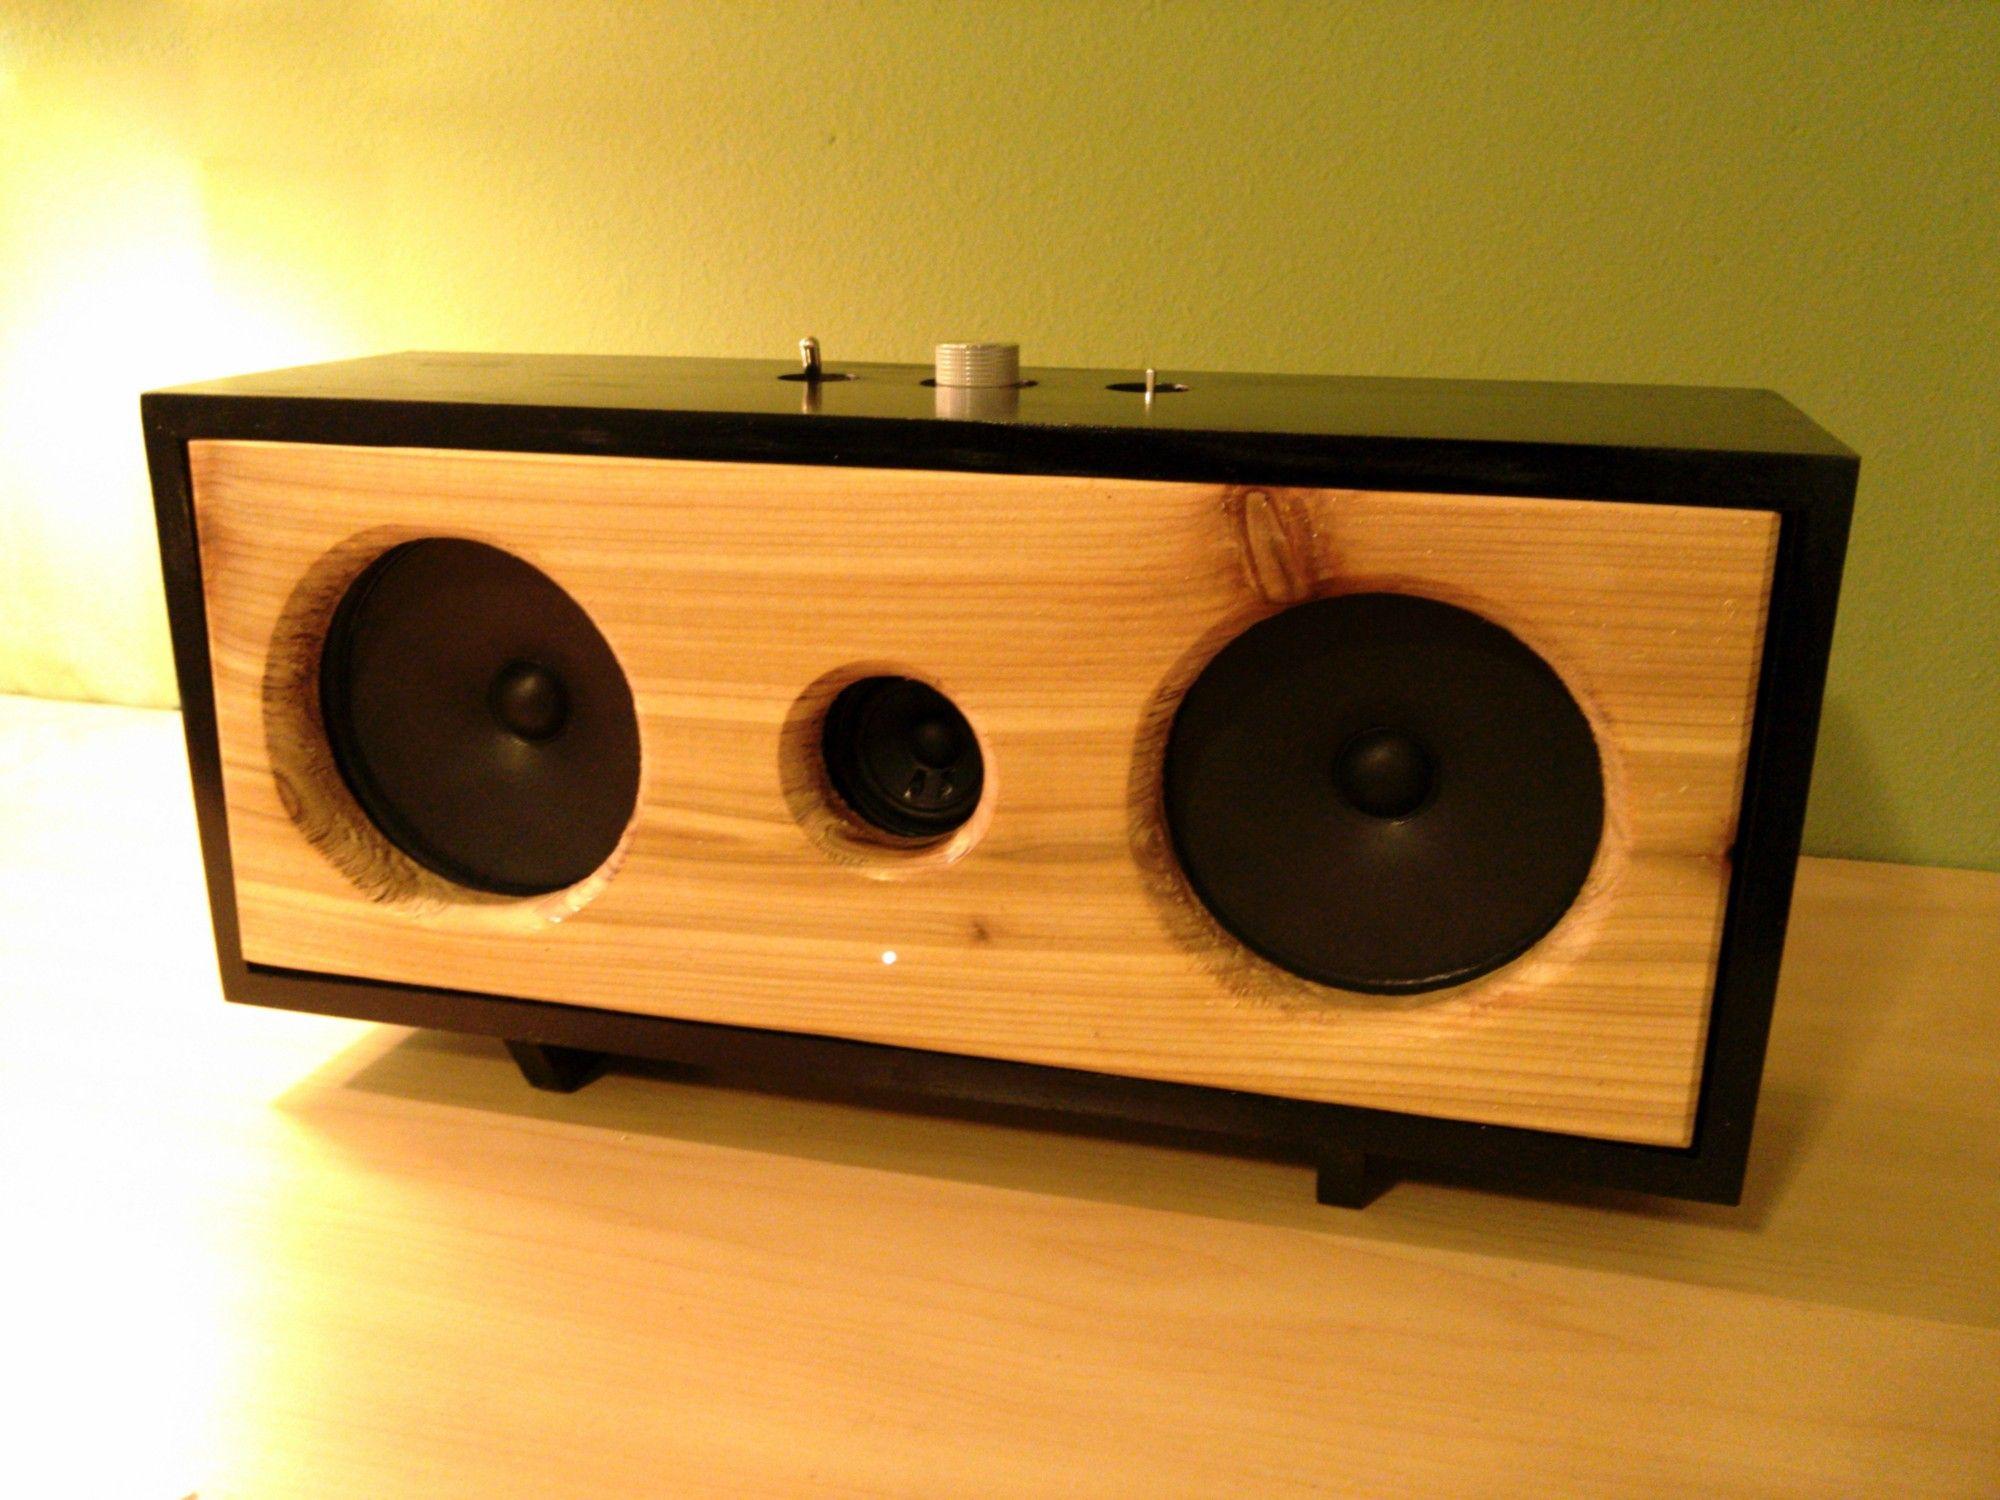 How to build a bluetooth speaker raspberry pi ideas diy a do it yourself adventure solutioingenieria Choice Image